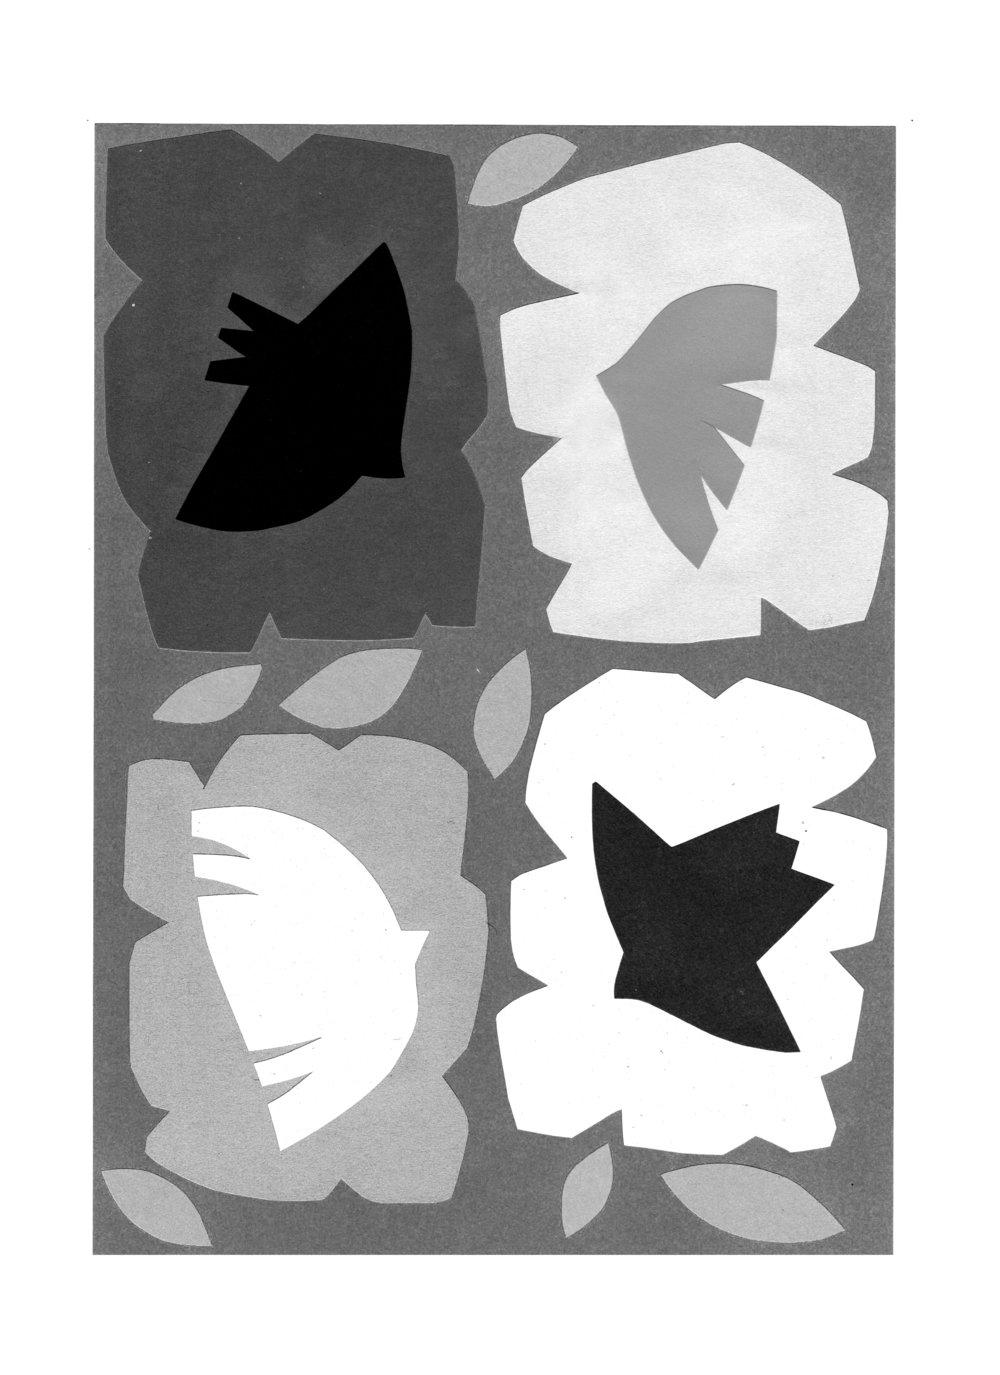 4x4 čb.jpg